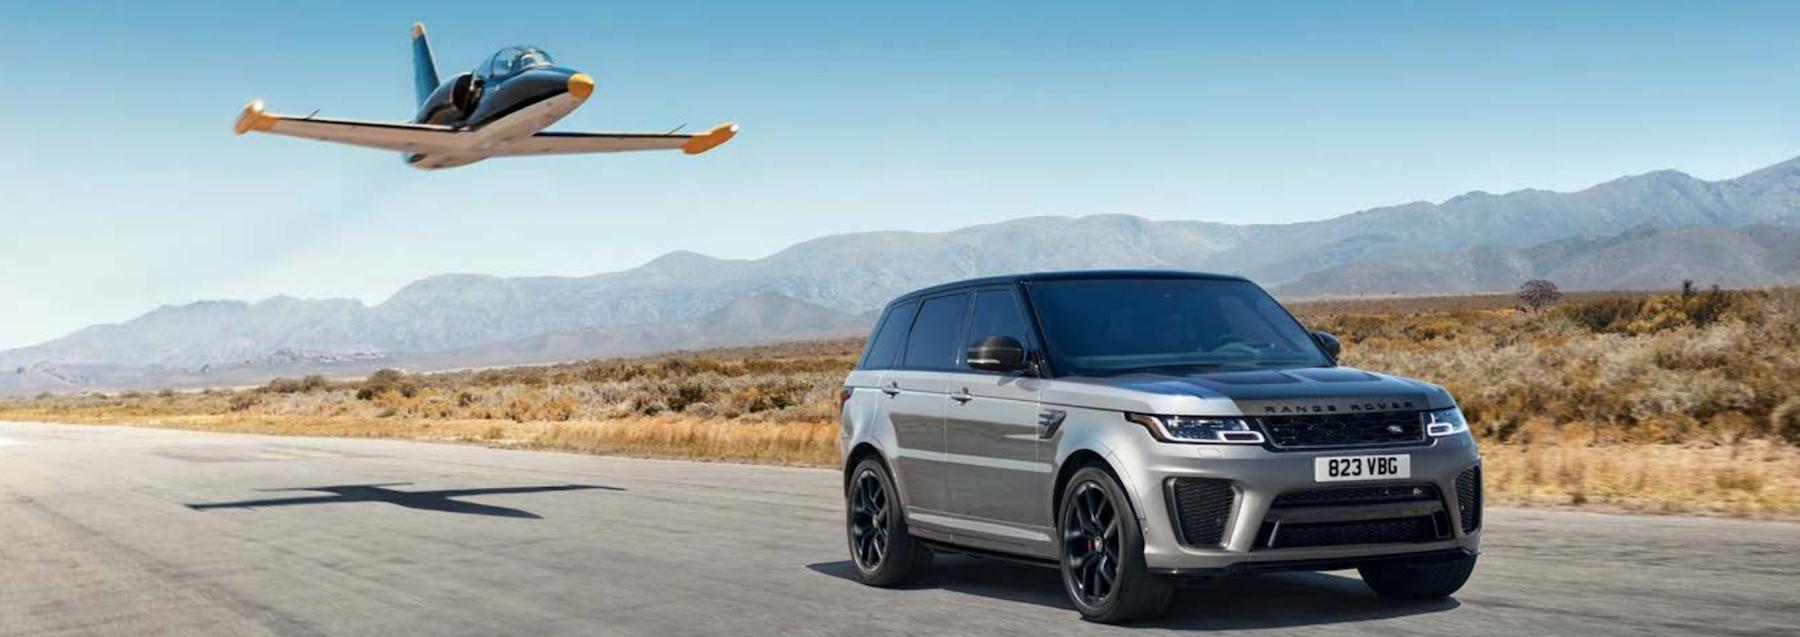 2021 Range Rover Sport Performance